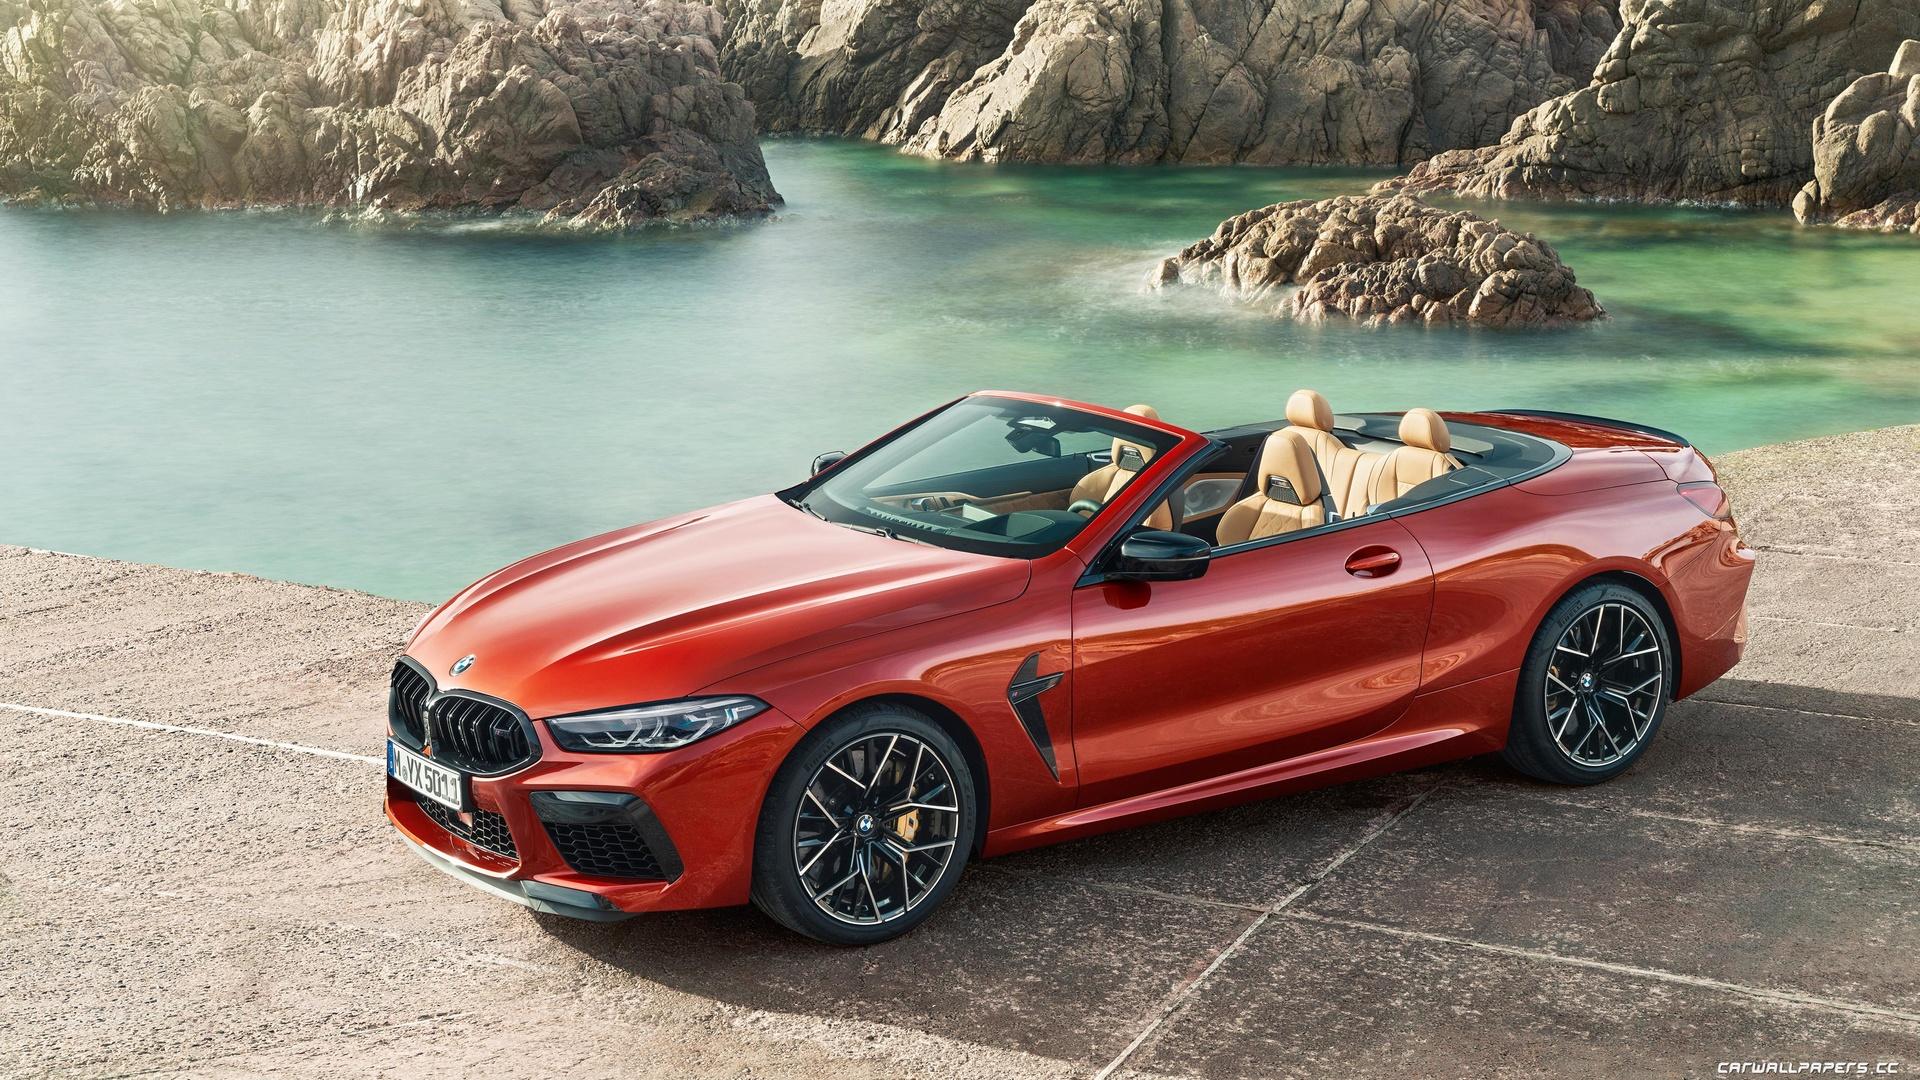 bmw, m8, competition, cabrio, worldwide, кабриолет, красный